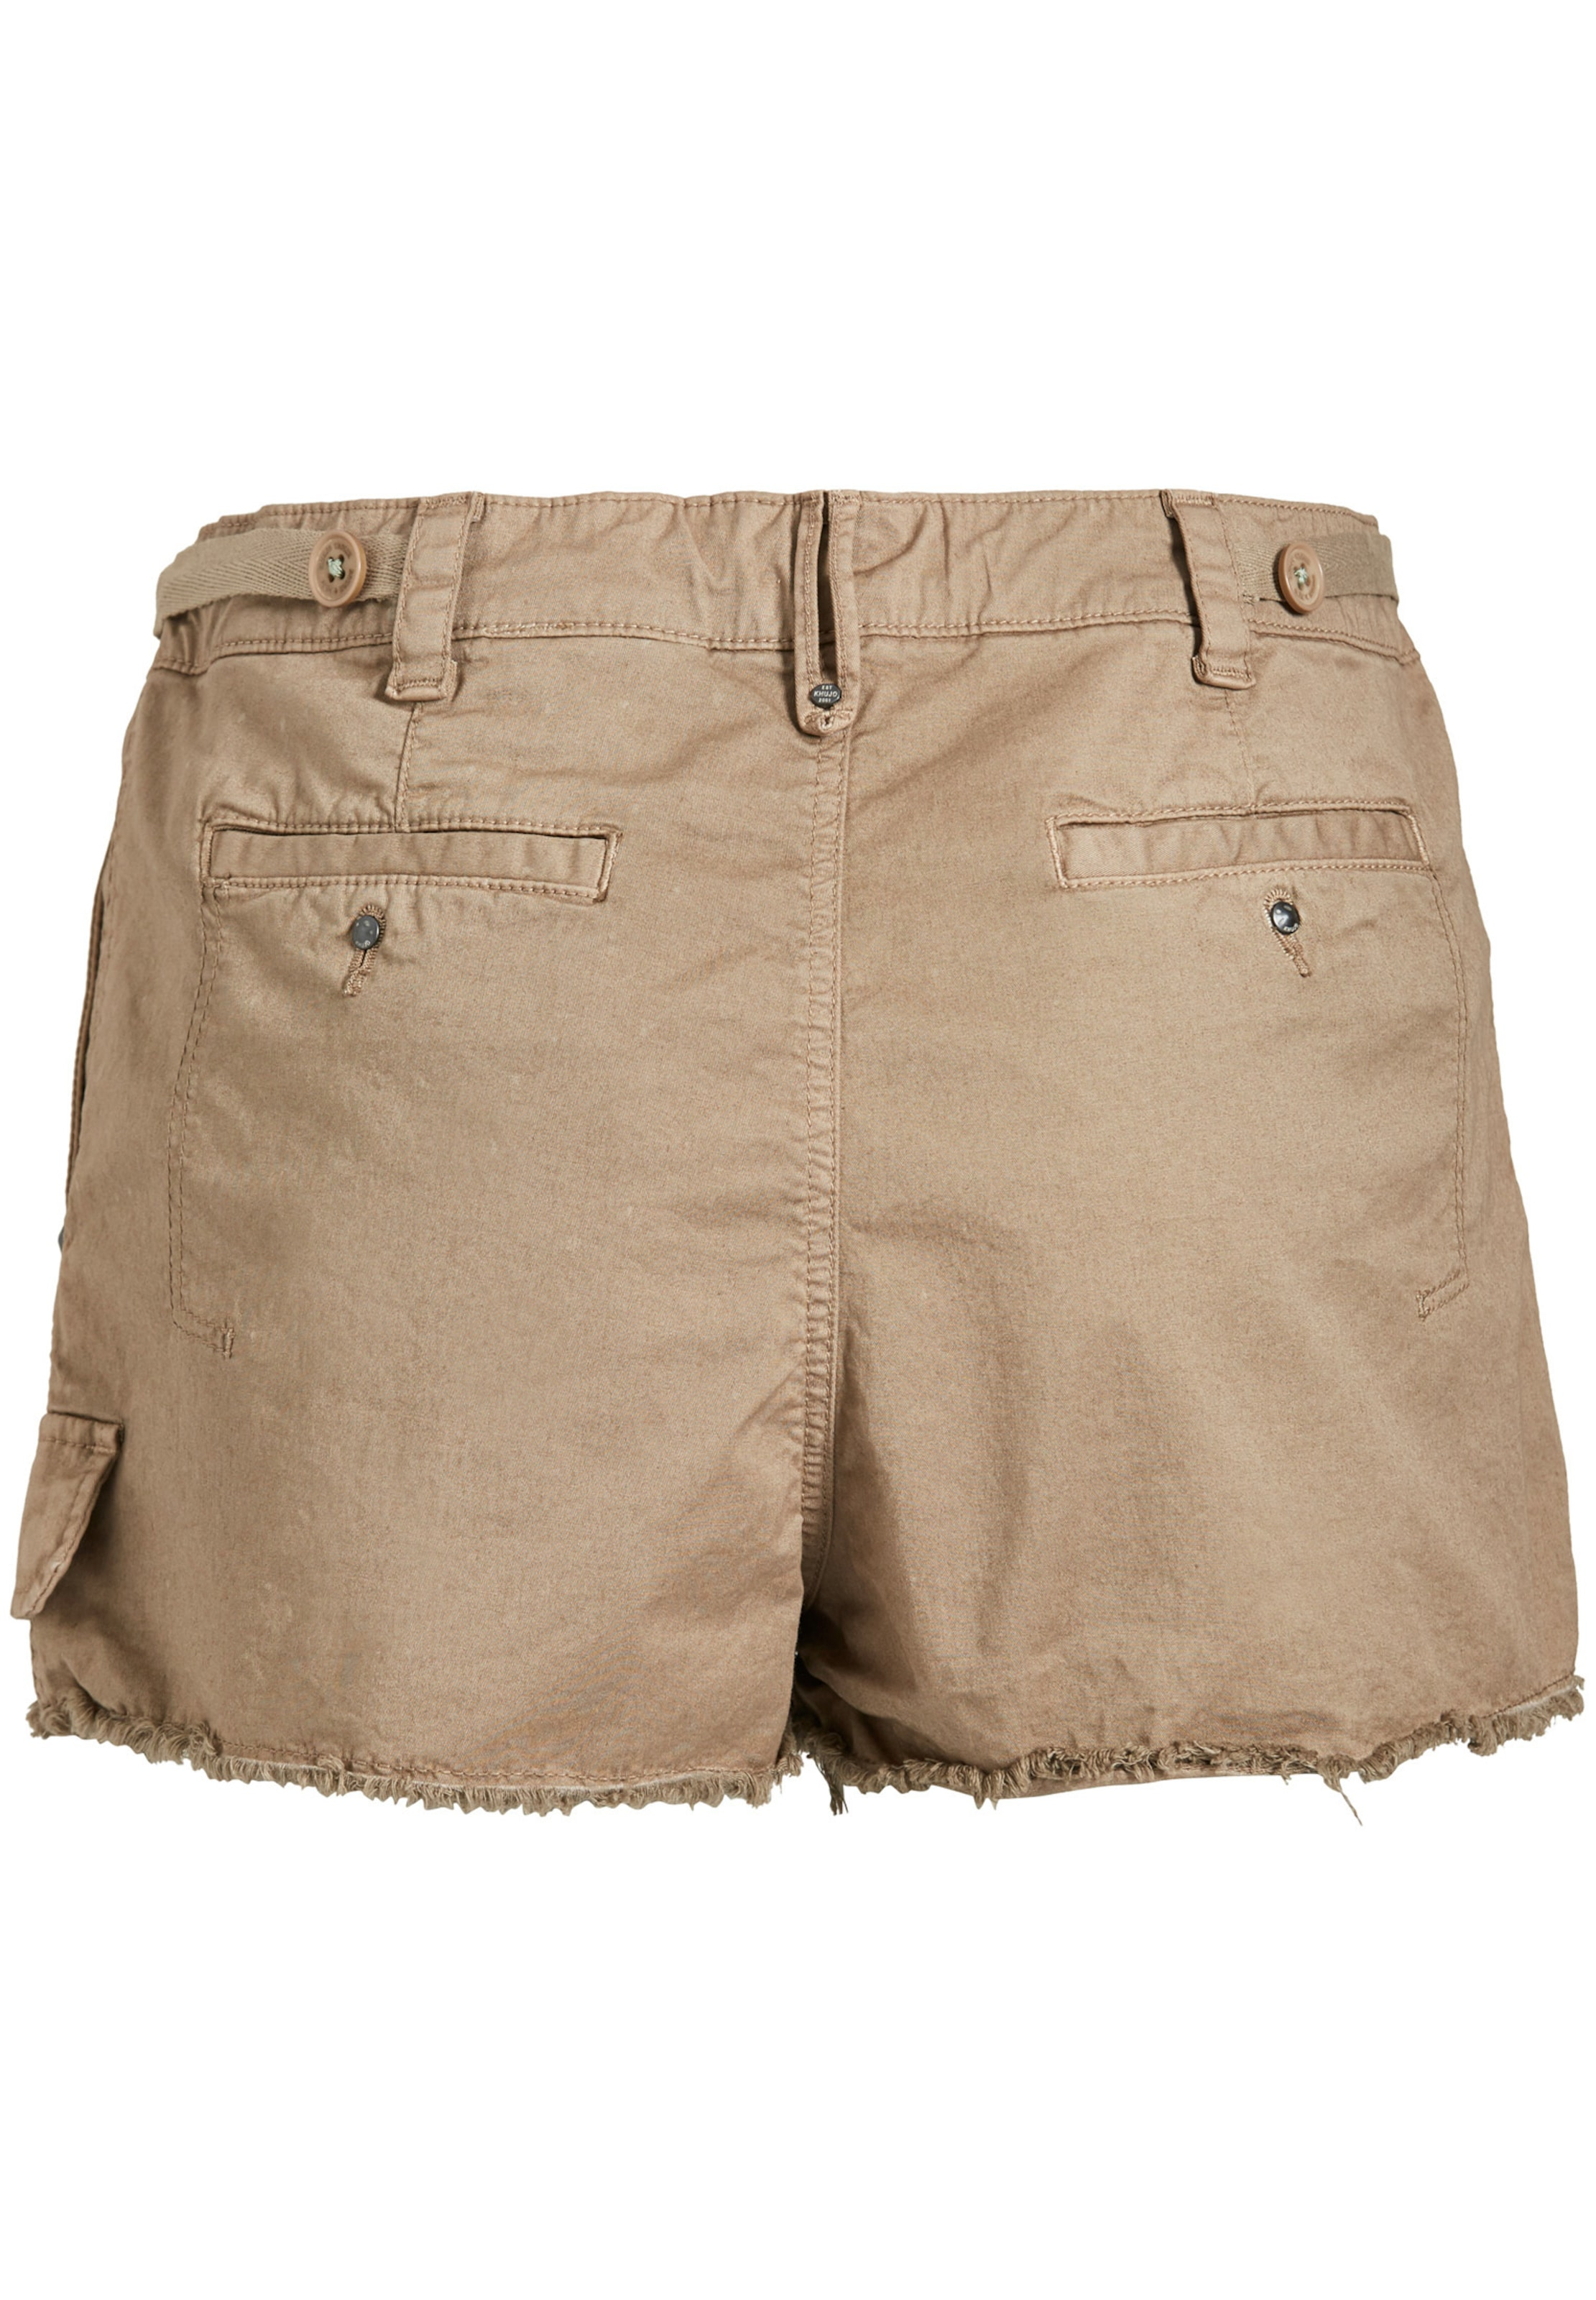 Khujo Khujo Khujo Pantalon 'cina' En Pantalon En Beige 'cina' Beige f6gb7Yy